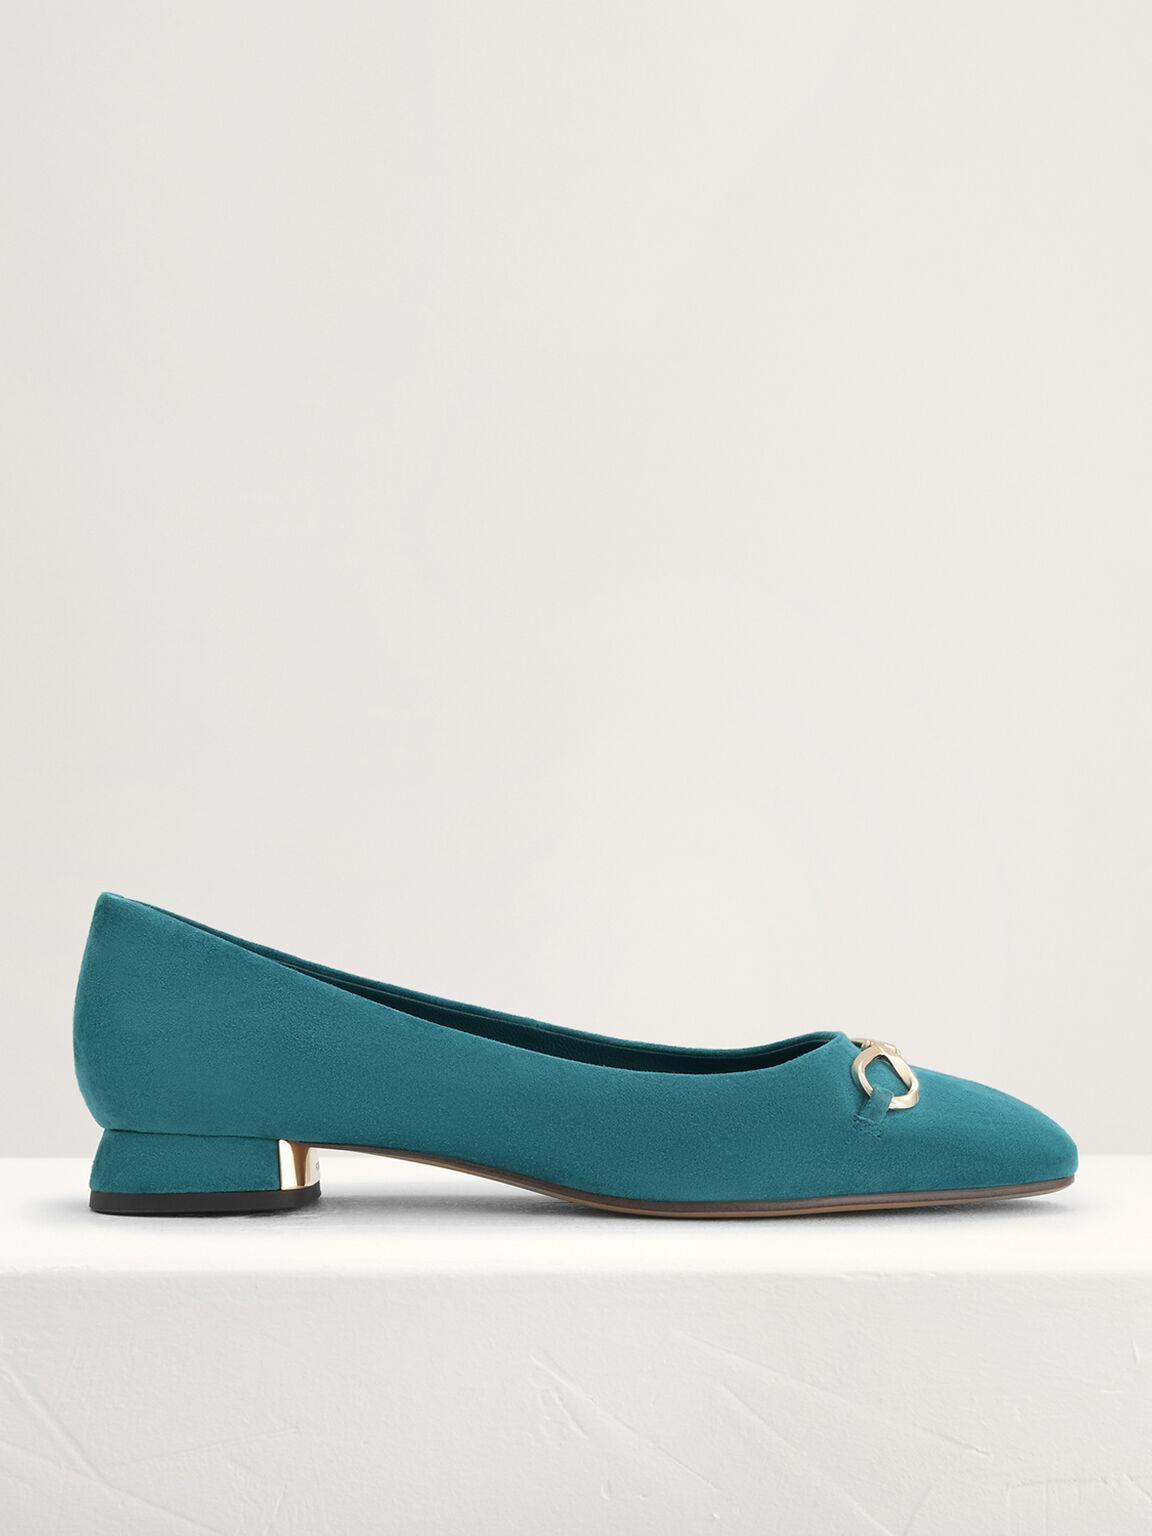 Suede Leather Ballerina Flats, Teal, hi-res